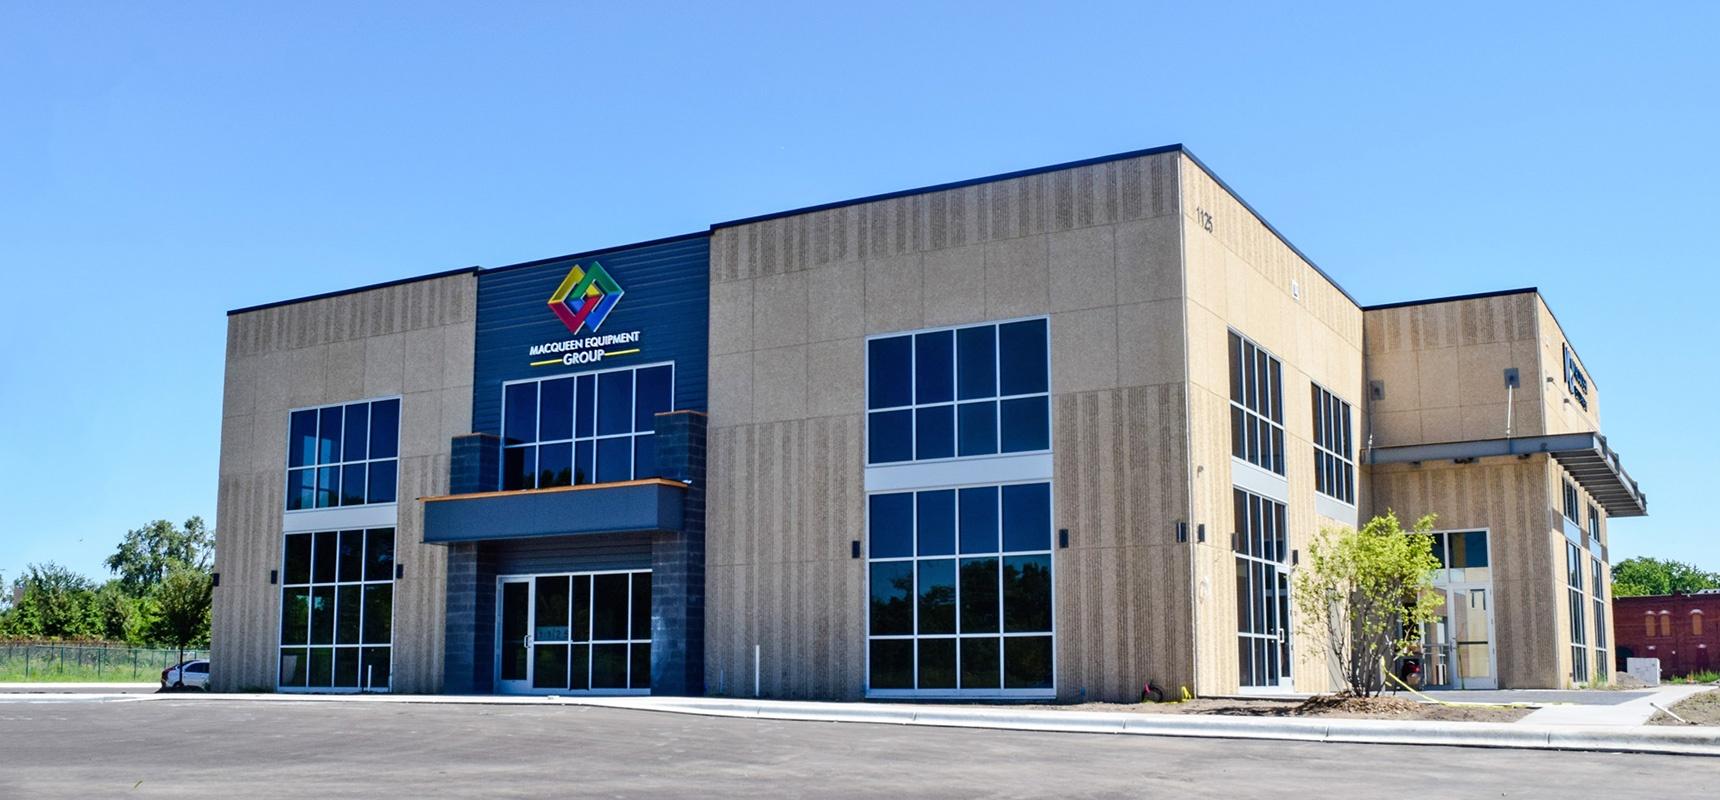 Pierce-Names-MacQueen-Emergency-Group-its-New-Dealer-in-Minnesota,-Nebraska-and-the-Dakotas_Header.jpg